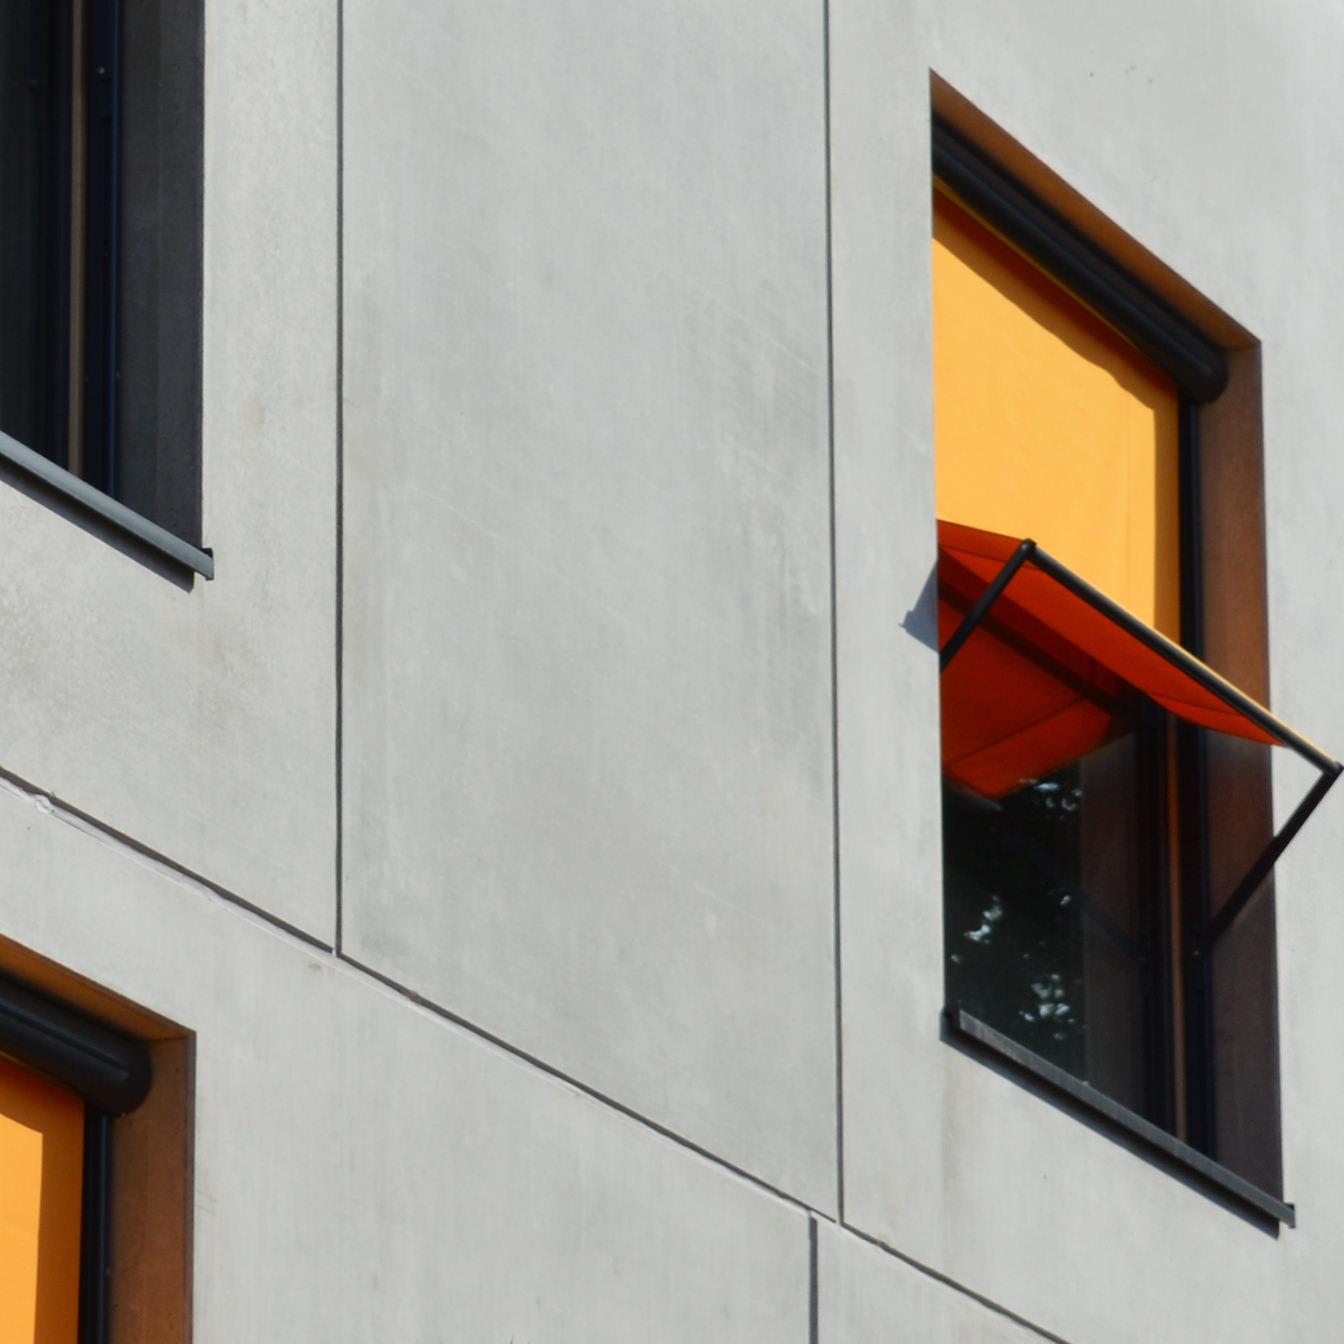 Hier sehen Sie Fassadenrollos als Senkrechtmarkise aus der Nähe.